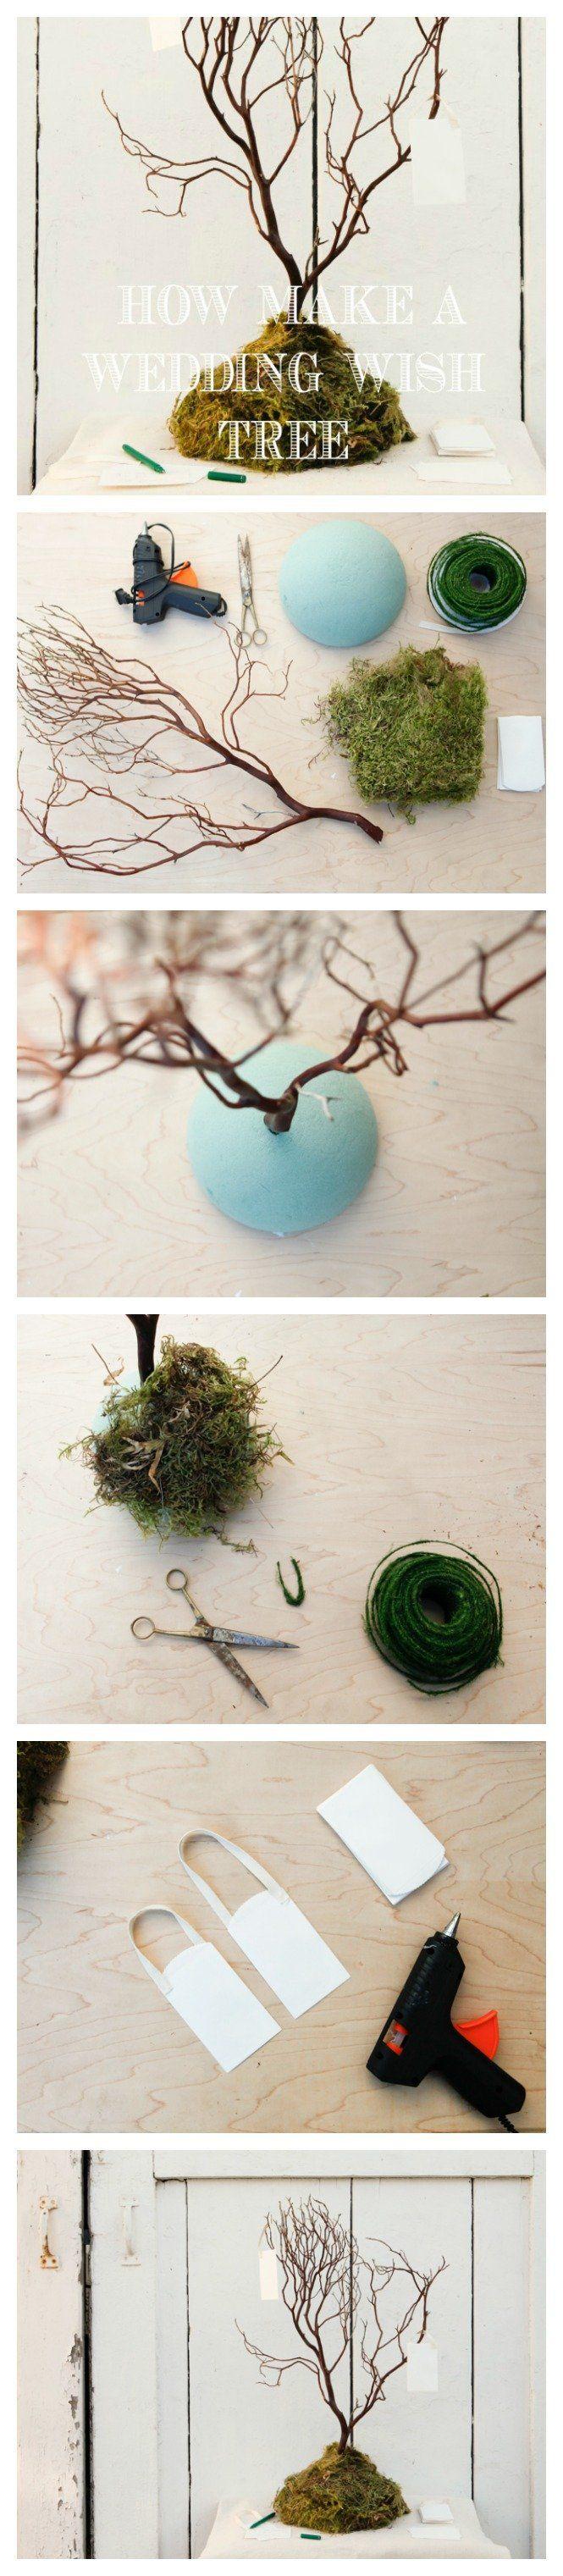 DIY Rustic Wedding Wish Tree   Pinterest   Weddings, Wedding and ...